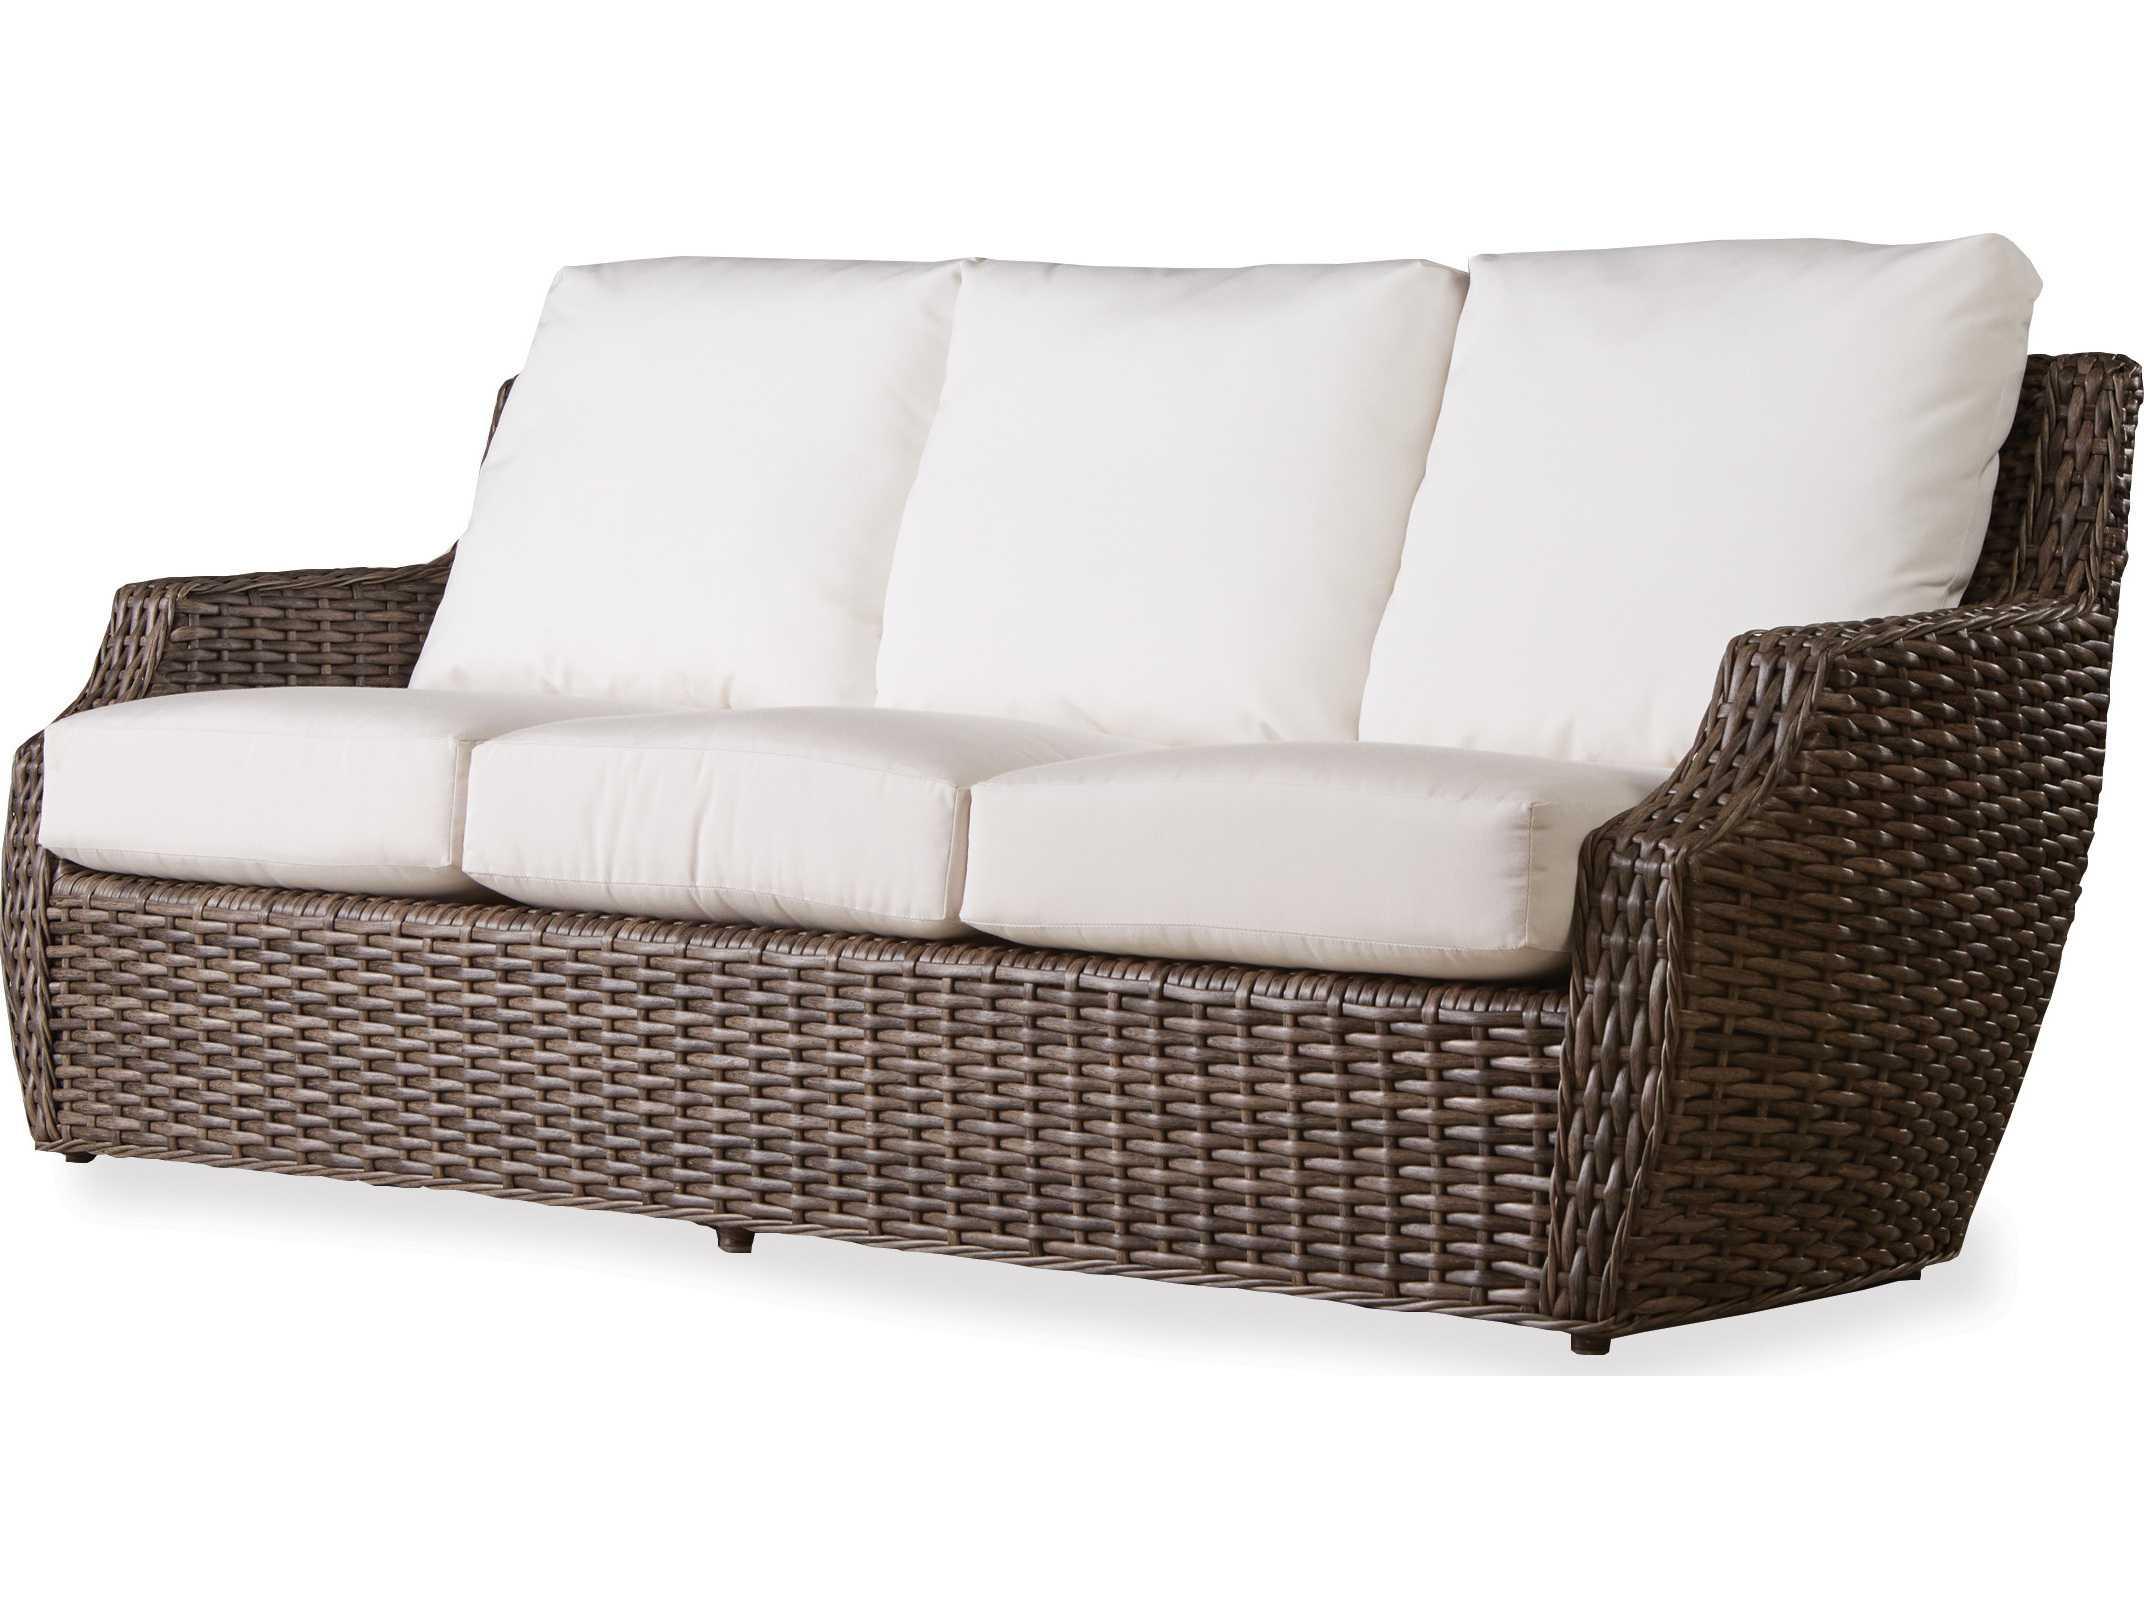 Lloyd Flanders Largo Replacement Sofa Seat Cushion